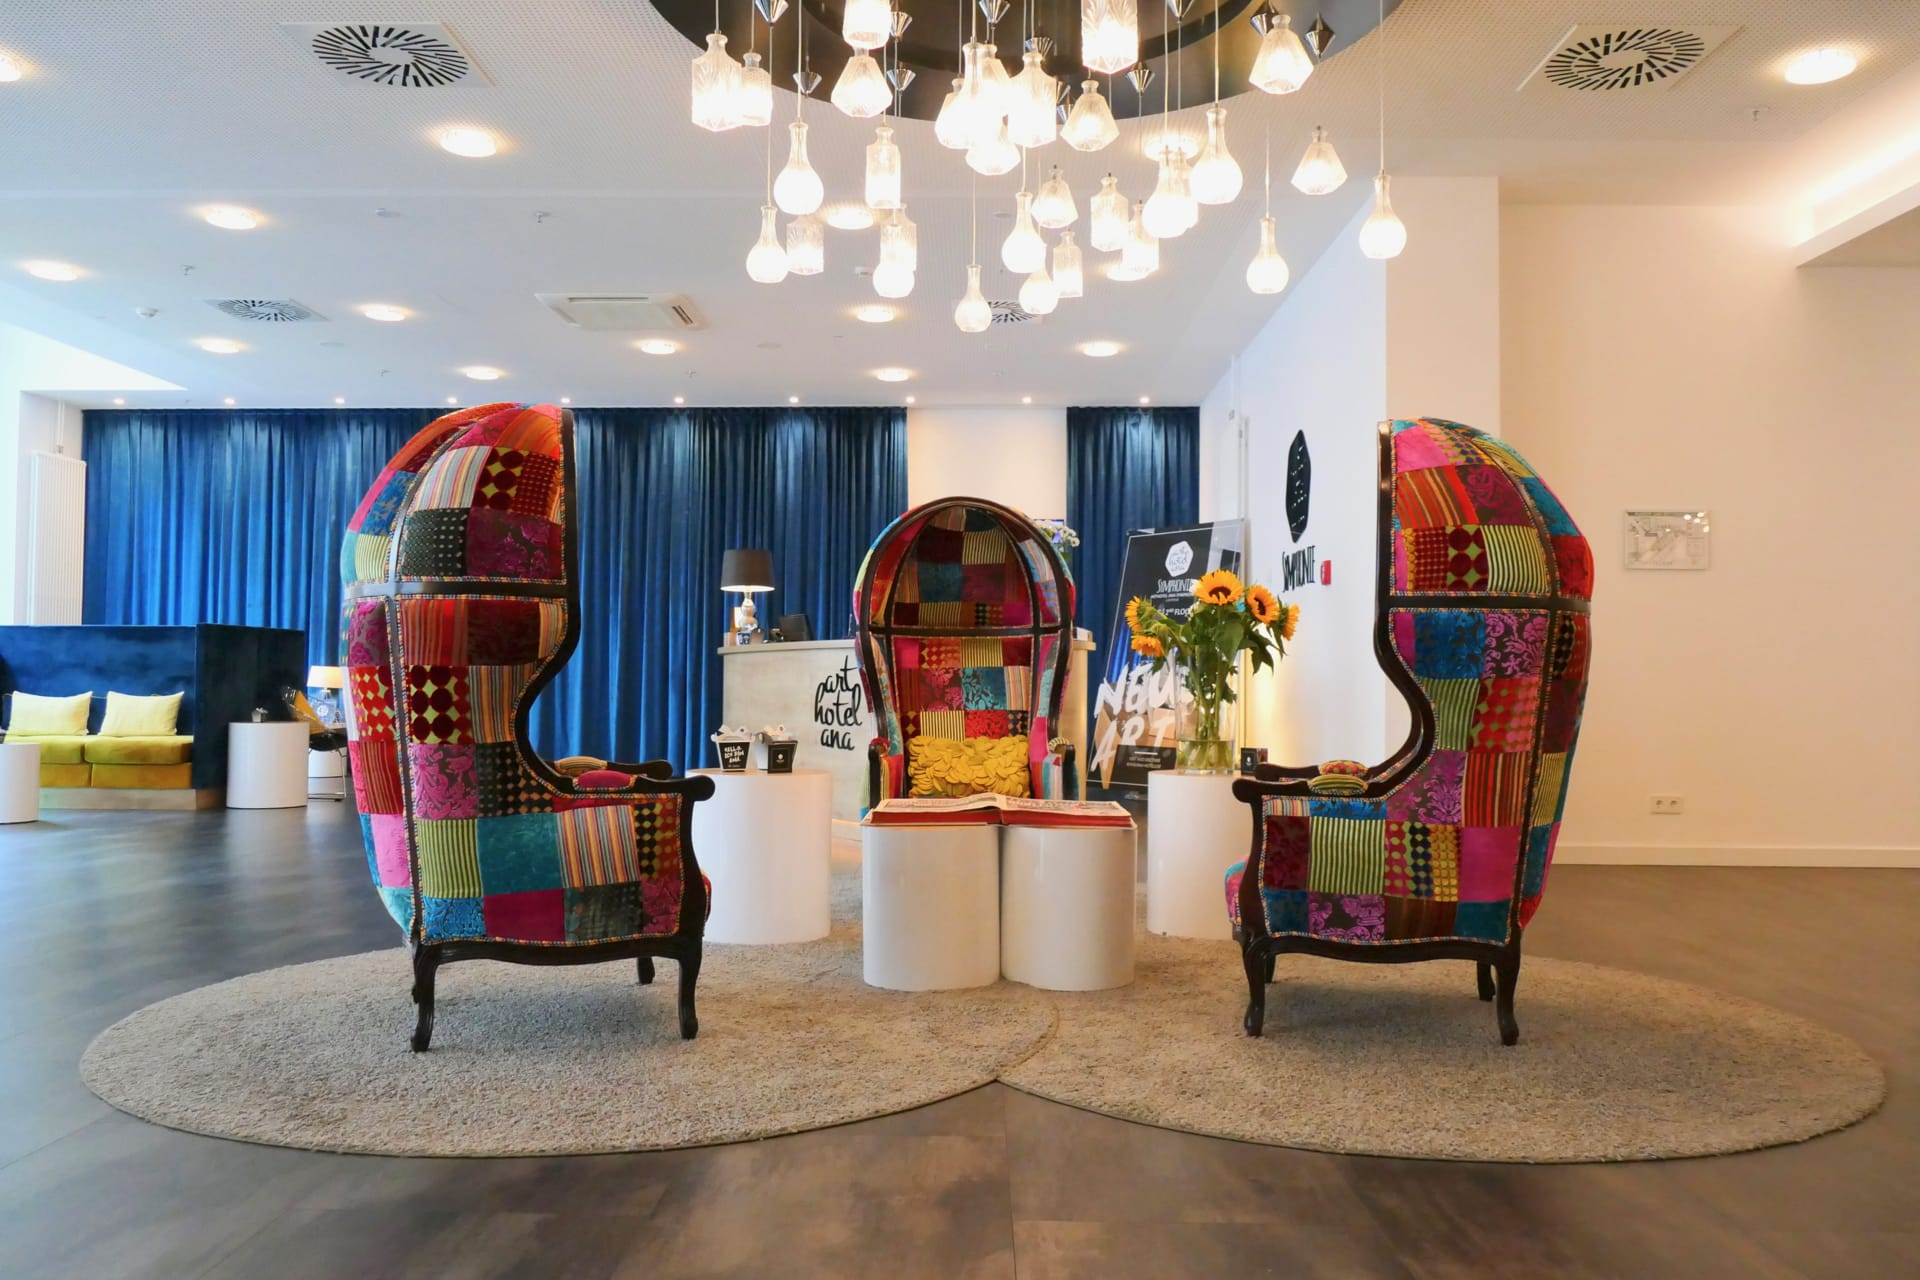 Ana art hotel